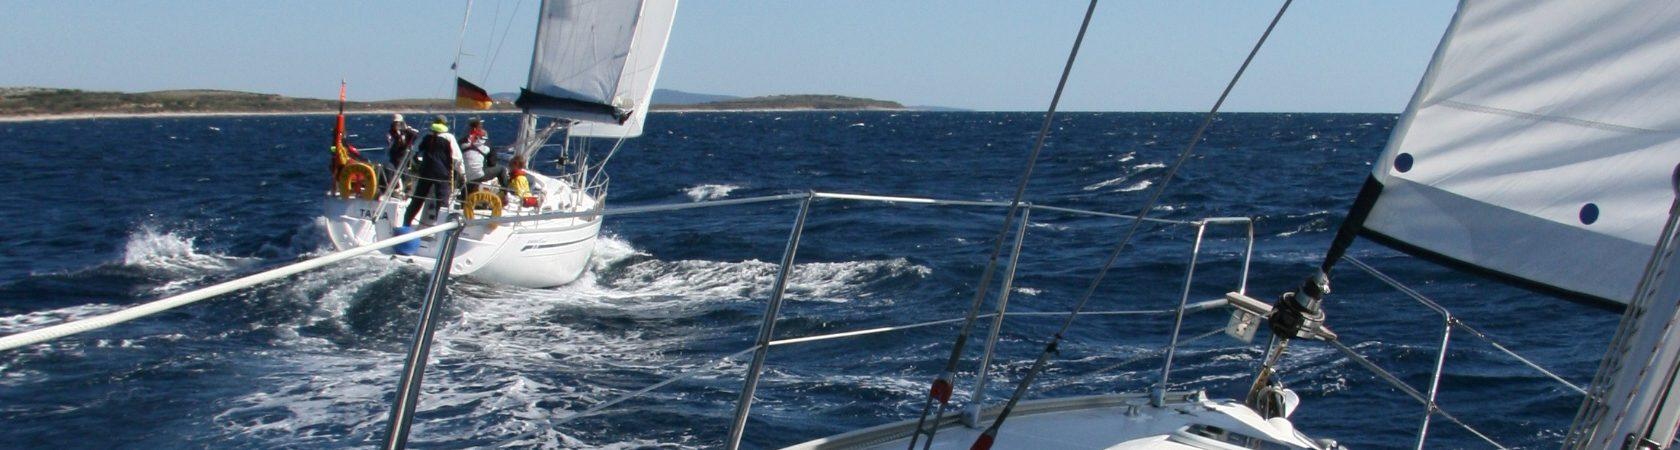 SKS Prüfungstörn Adria Mittelmeer